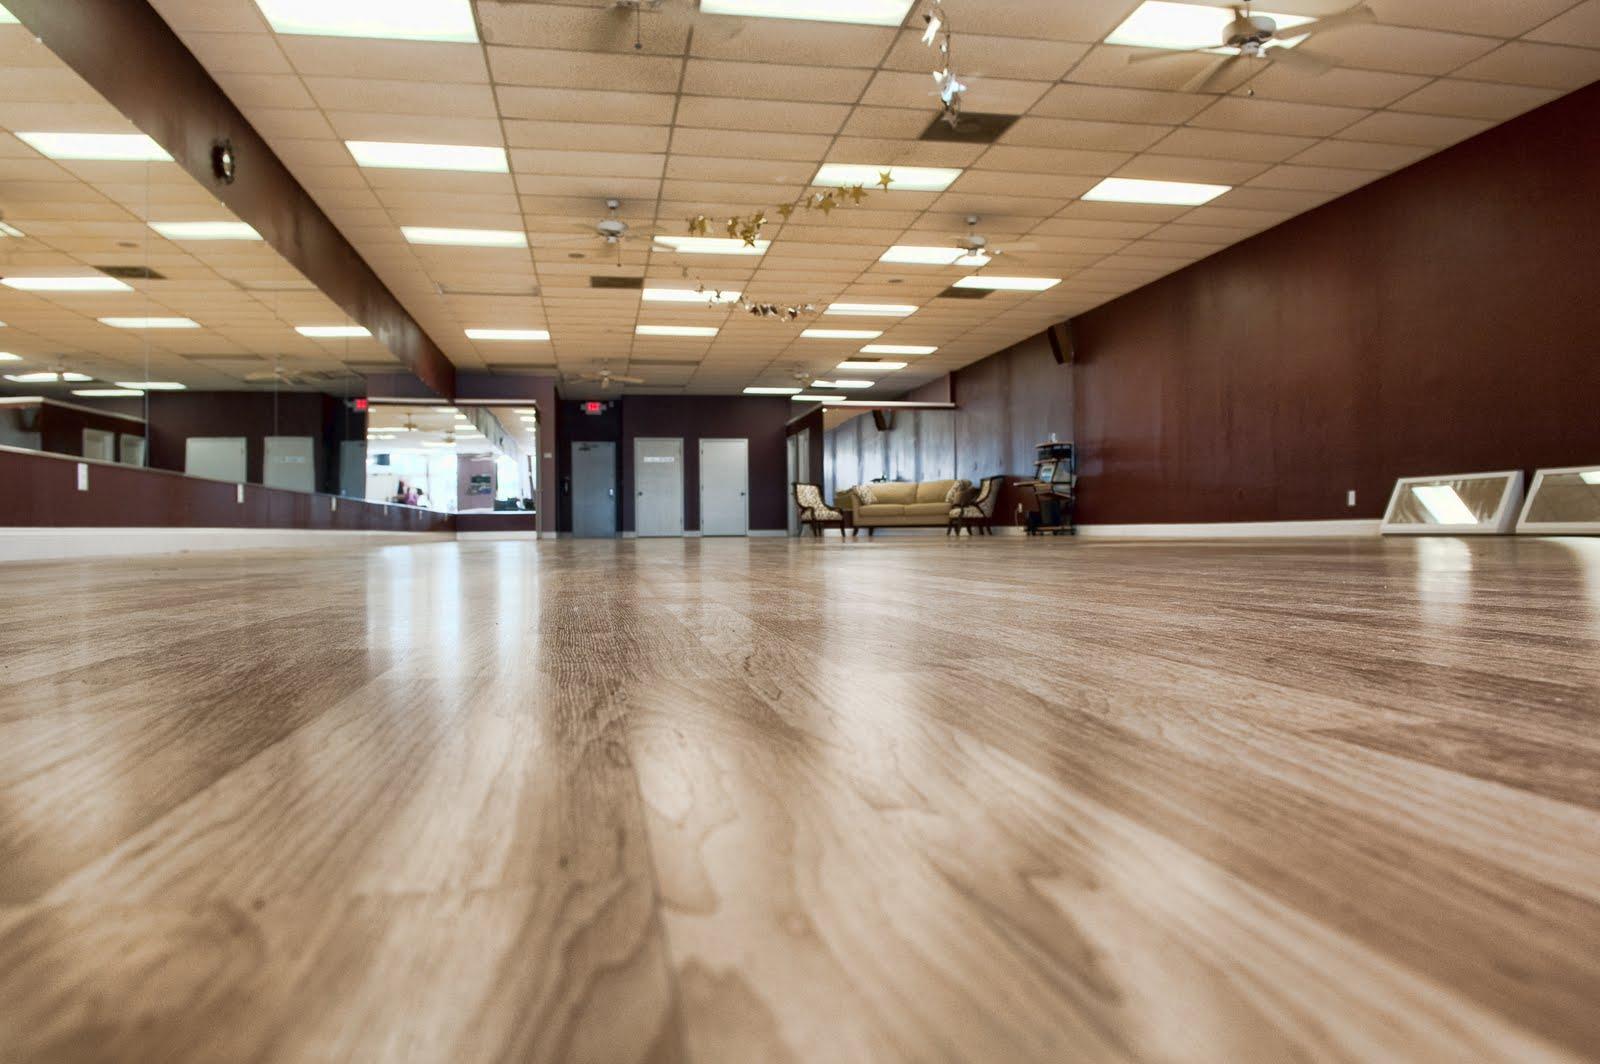 Ballet dancers handrail home improvement for The design studio